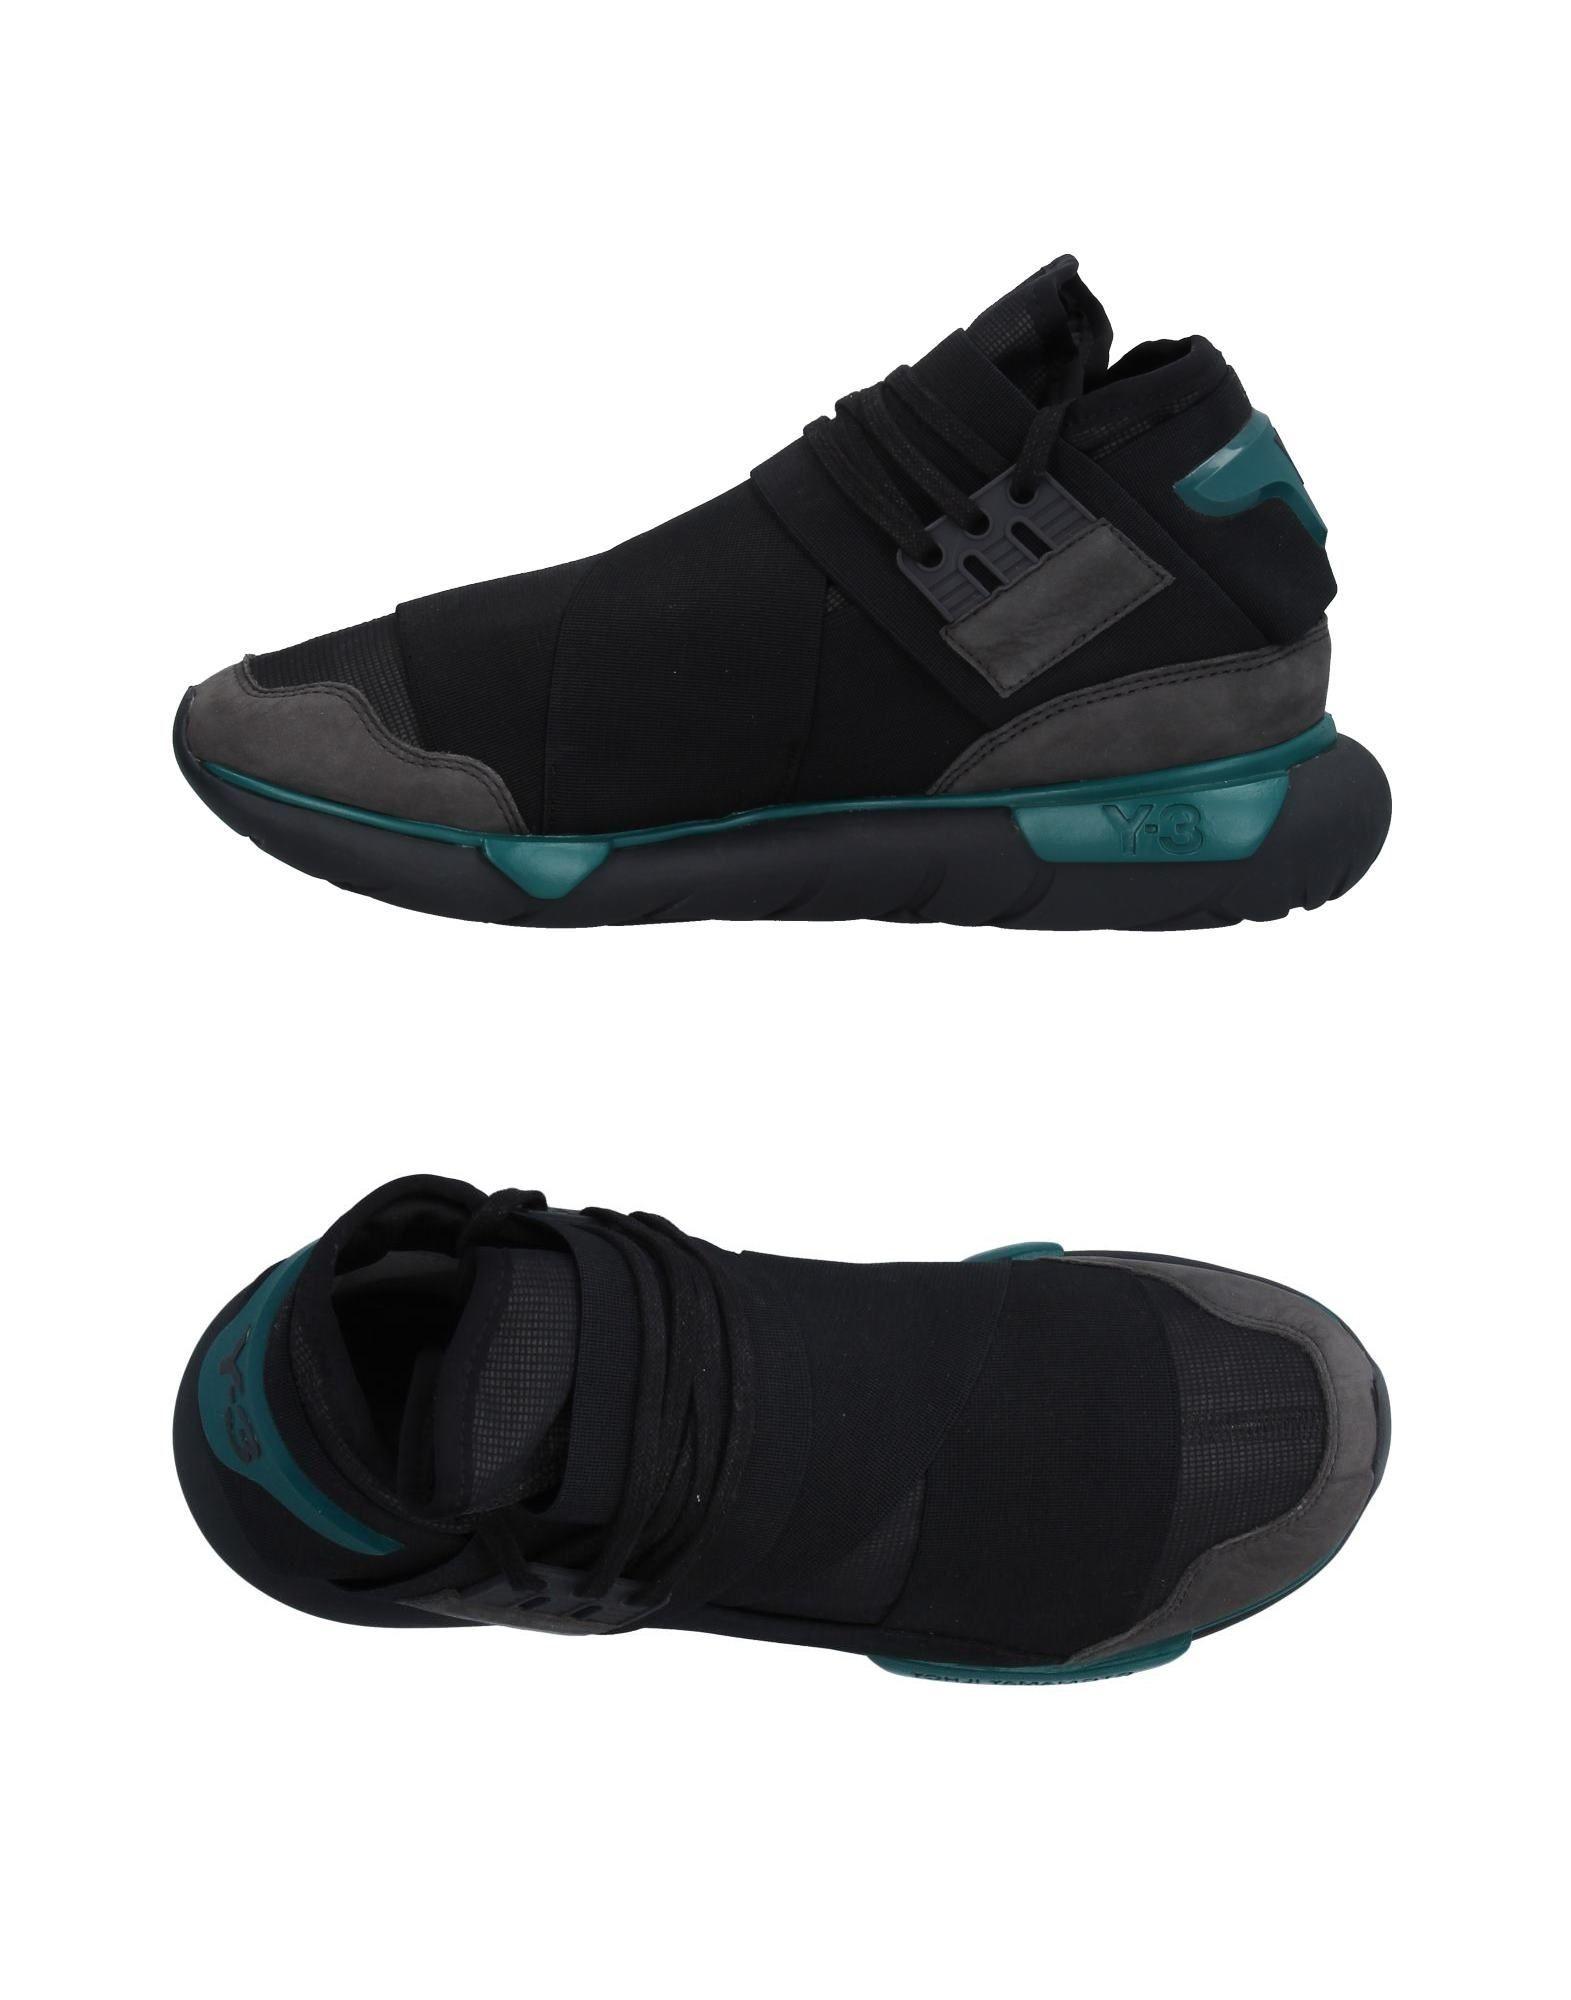 Moda Sneakers Y-3 Y-3 Sneakers Uomo - 11414008EM c1c90b